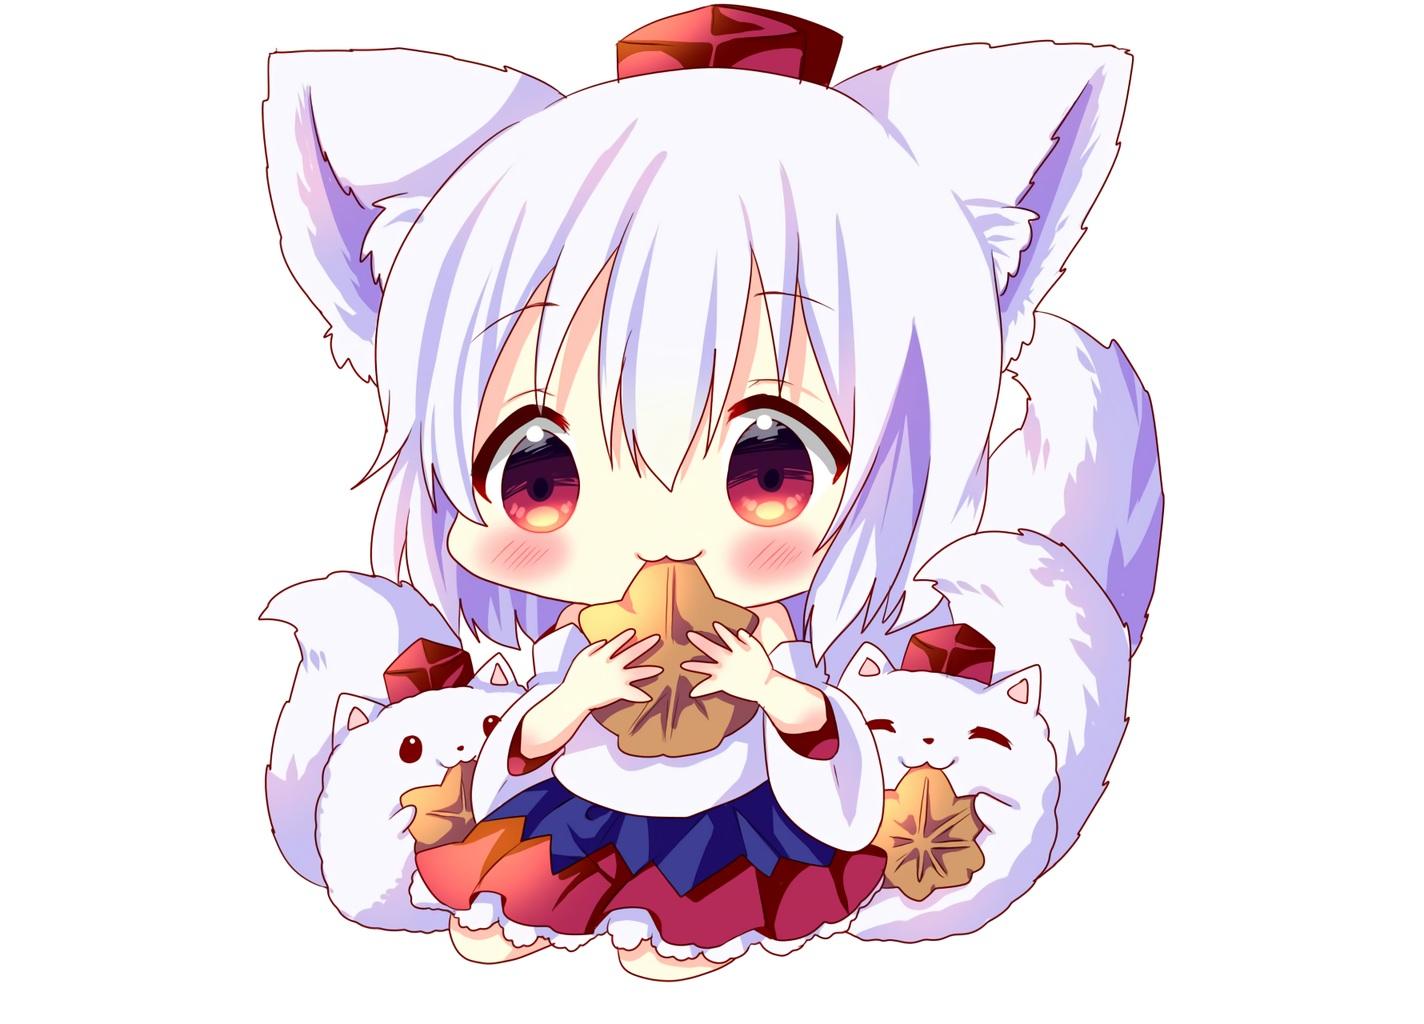 animal animal_ears blush cat_smile chibi hat hina_hina inubashiri_momiji japanese_clothes red_eyes short_hair skirt tail touhou waifu2x white white_hair wolfgirl